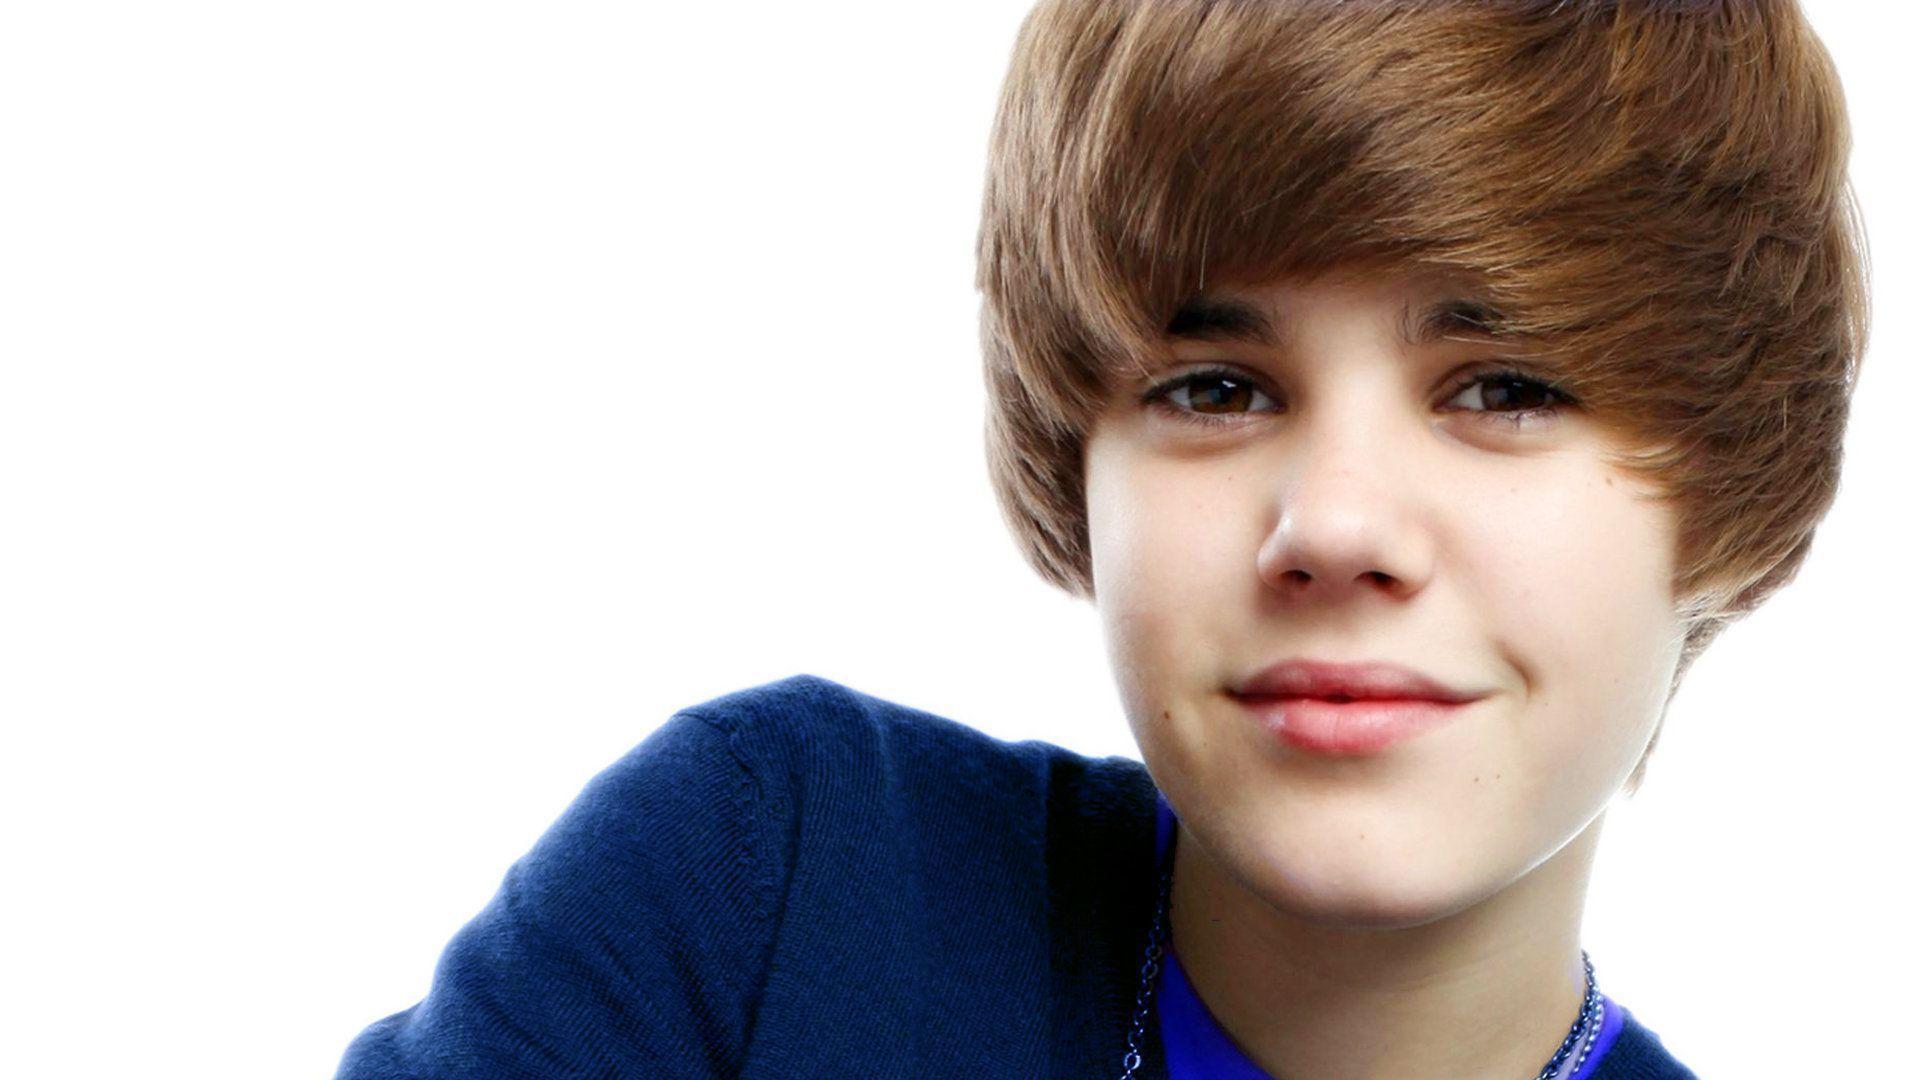 Hd wallpaper justin bieber - Justin Bieber New Wallpapers 2016 Wallpaper Cave